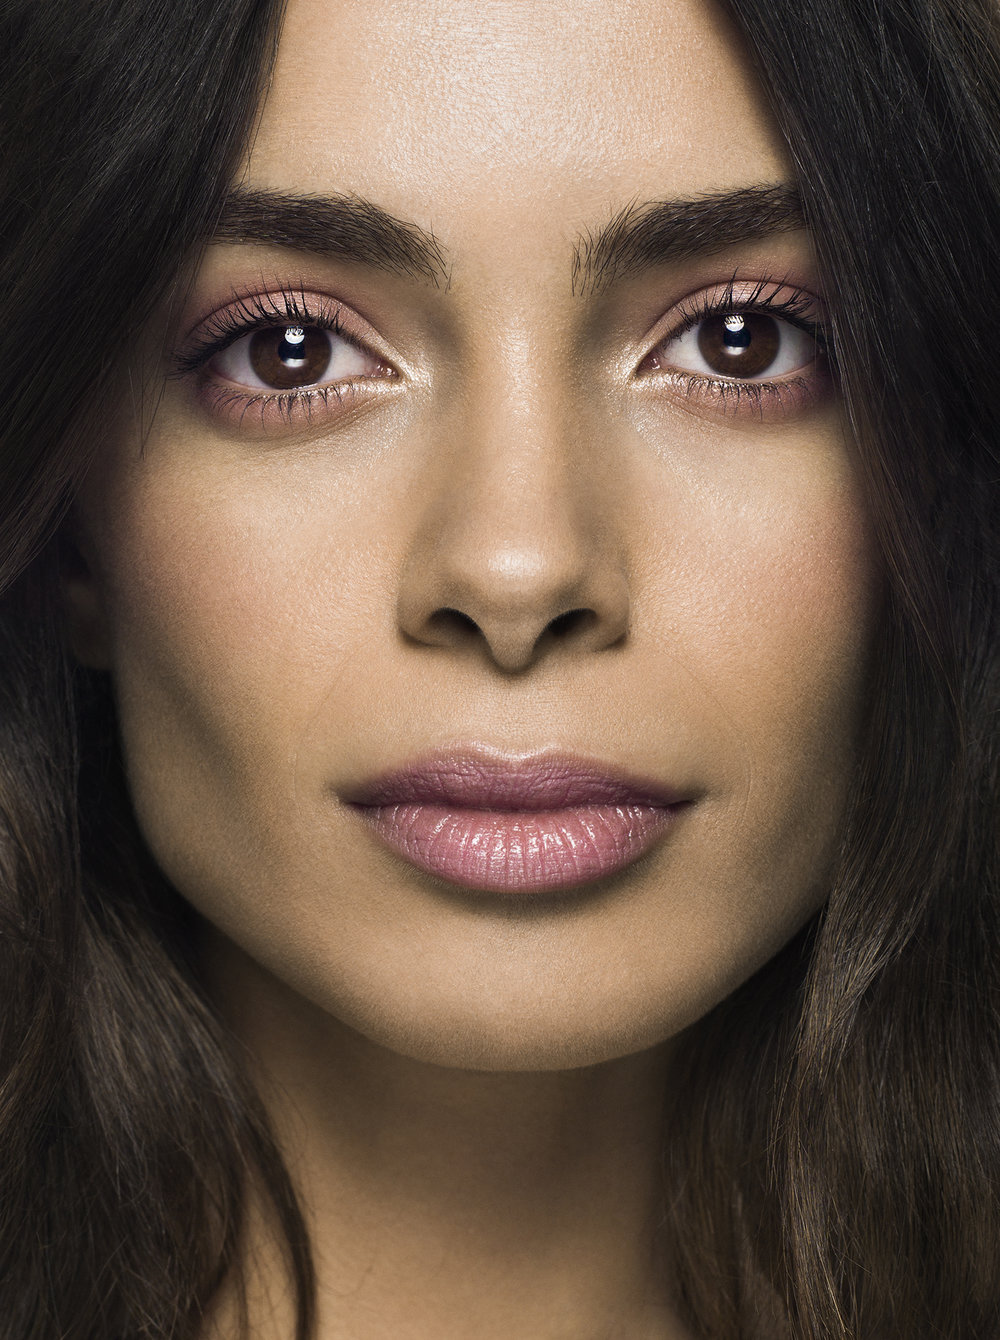 Oscar-arribas-photography-fotografo-portrait-retrato-editorial-fashion-beauty-14.jpg